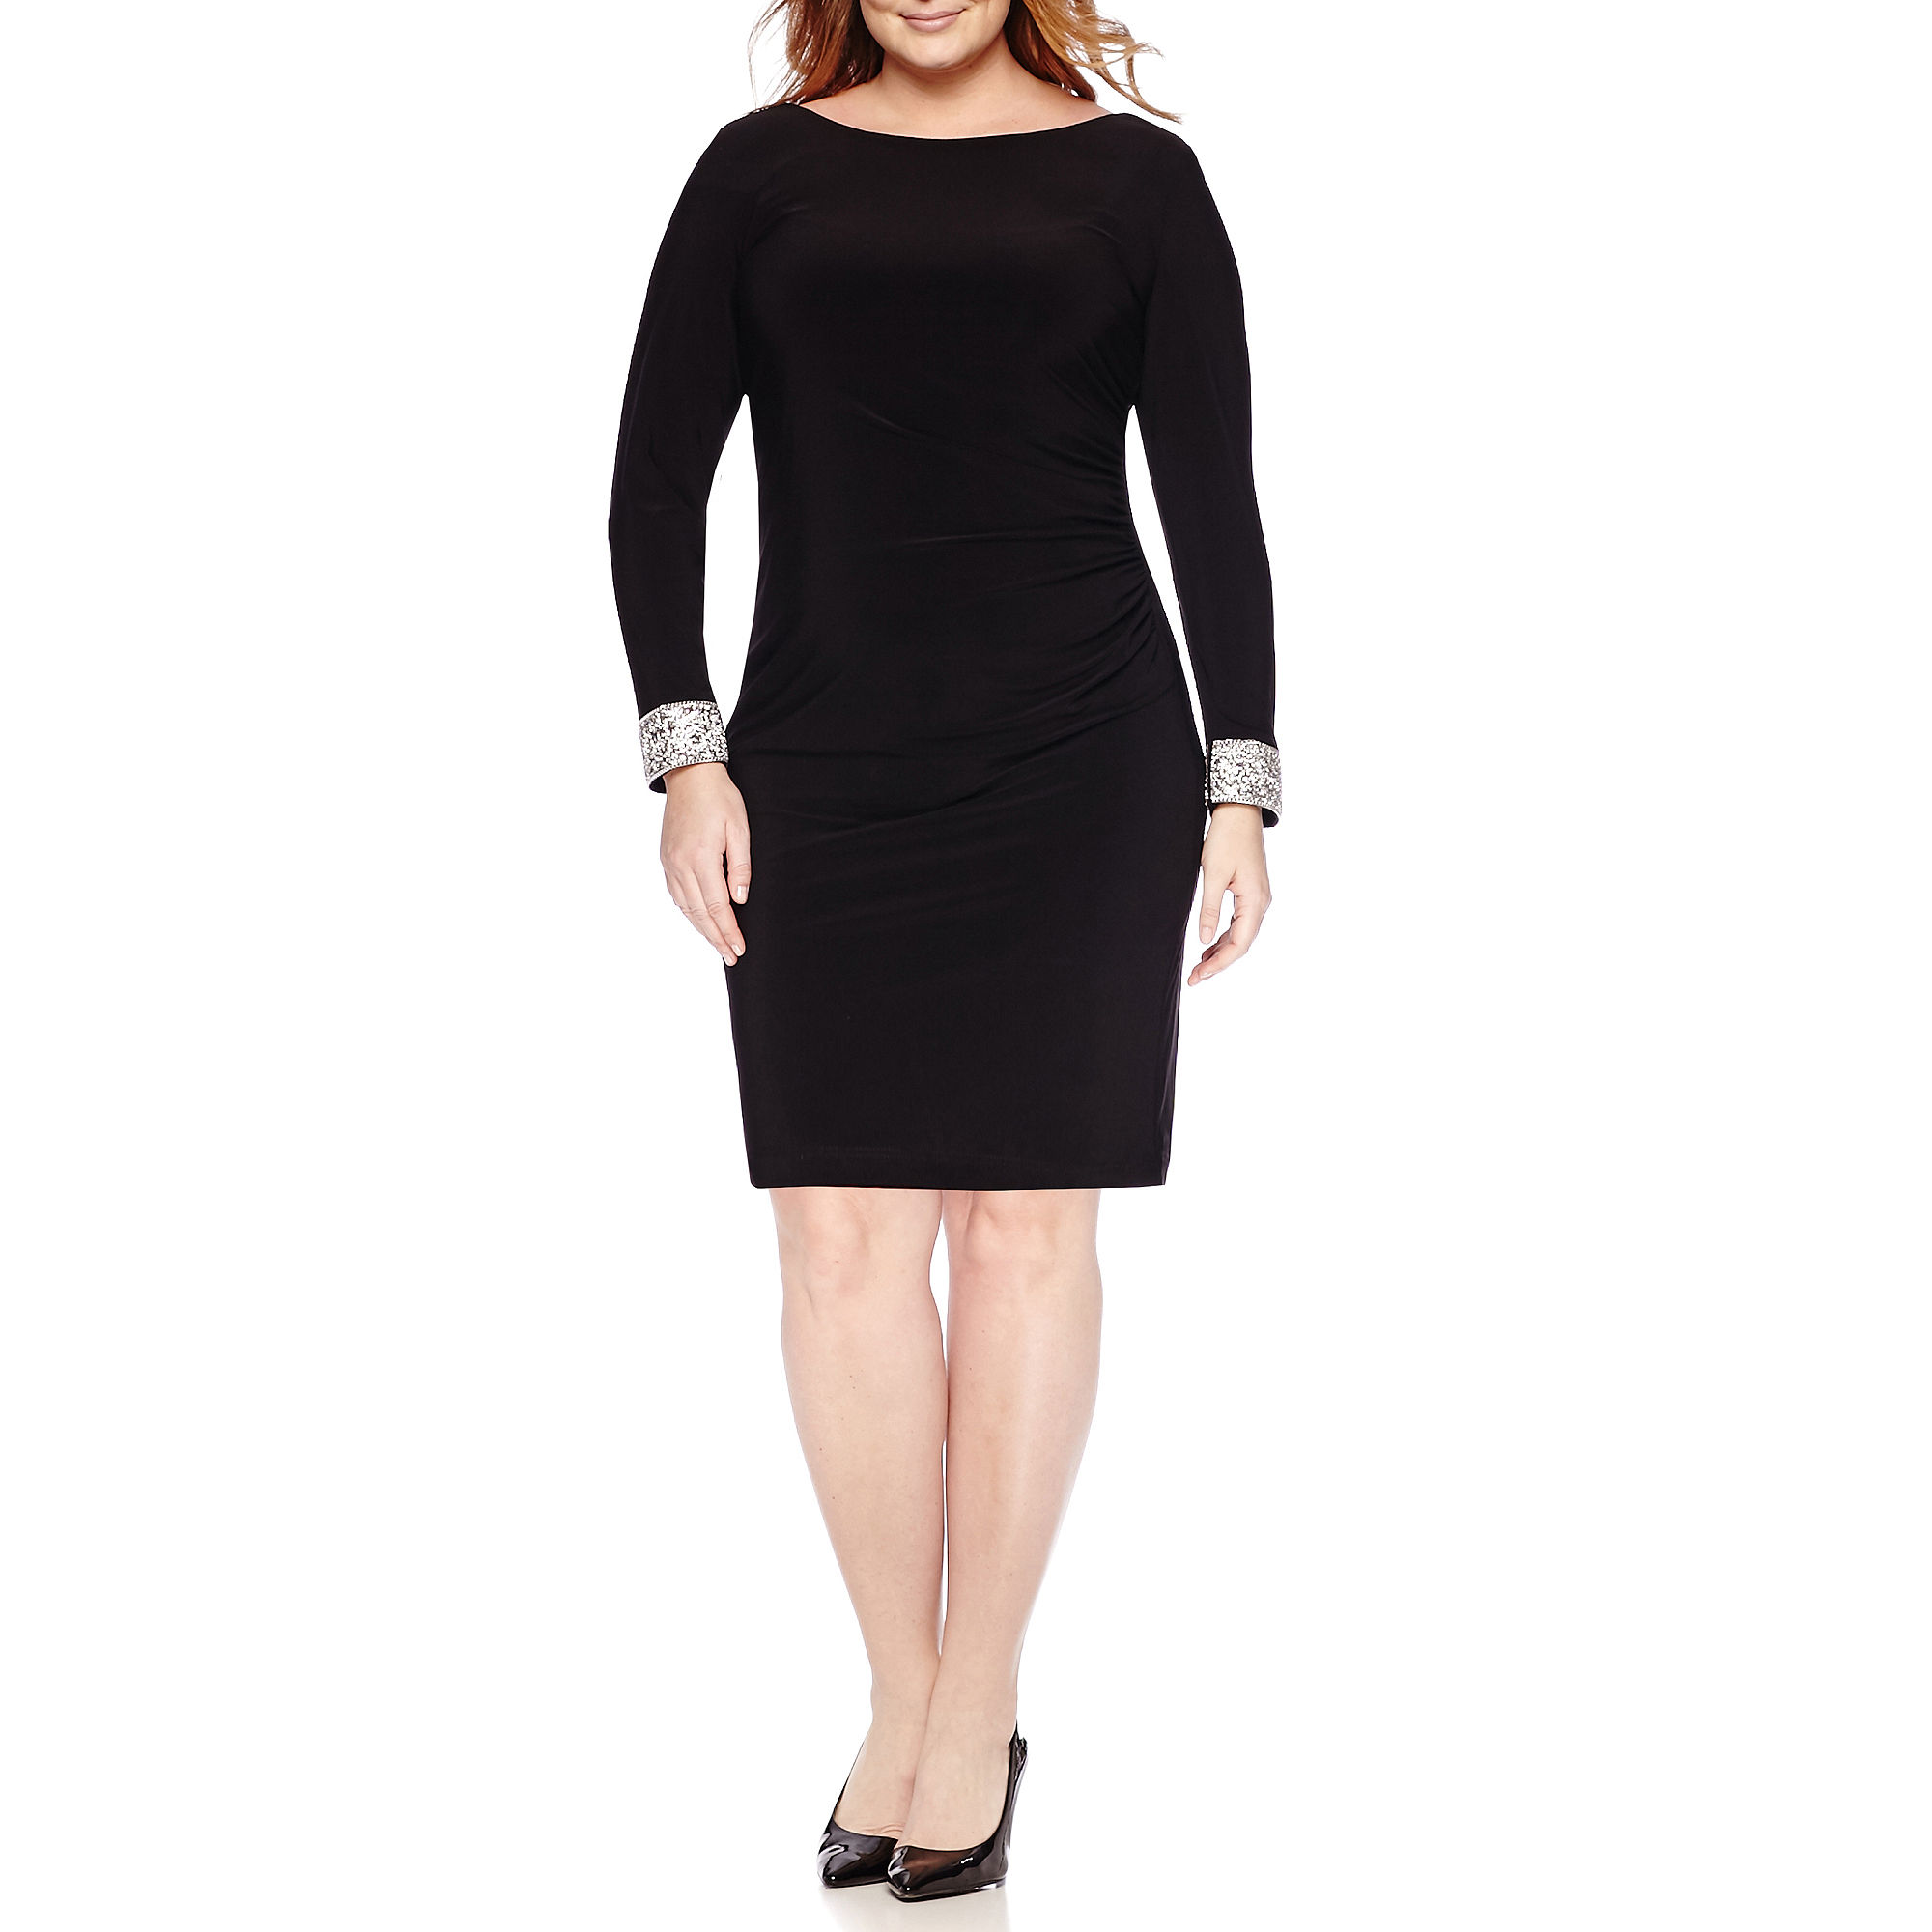 a8d42be98e87a UPC 659337591639 product image for Blu Sage Long-Sleeve Back-Drape Sheath  Dress - UPC 659337591639 product image for Side-Shirred ...